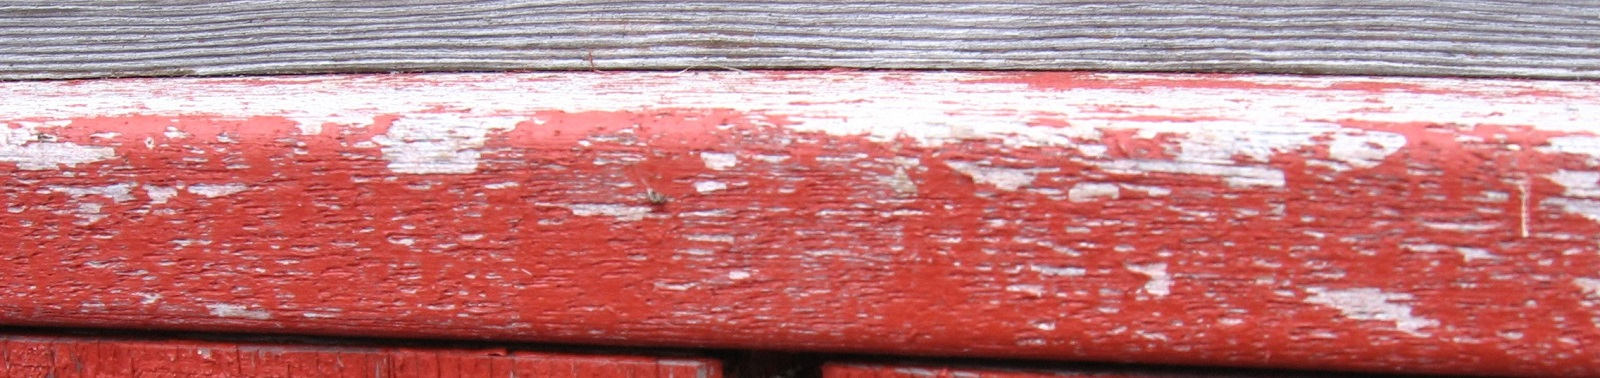 Wood Grain Detail